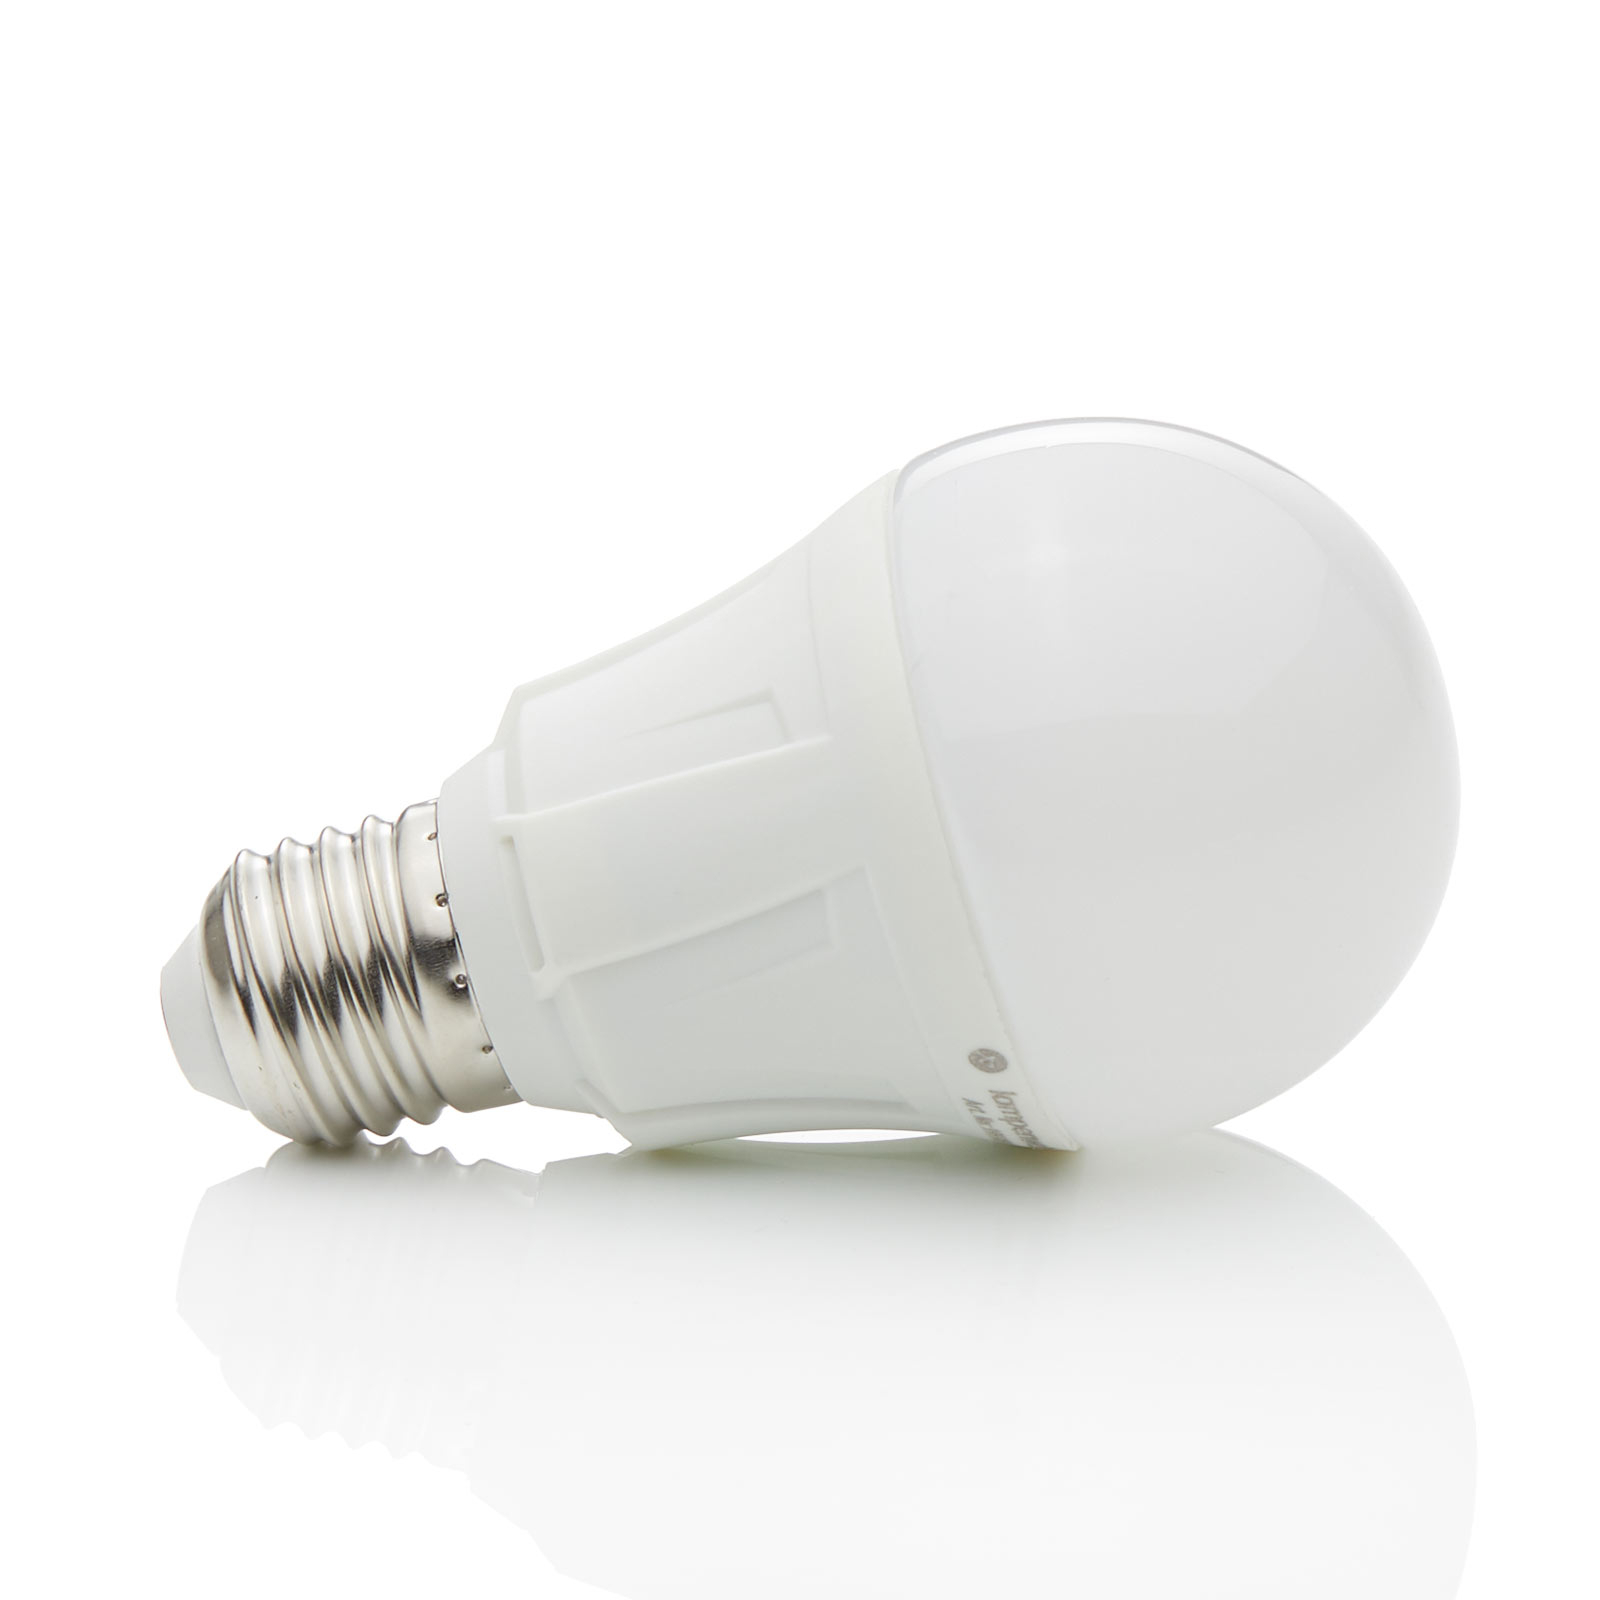 E27 11W 830 LED-lampa i glödlampsform, varmvit